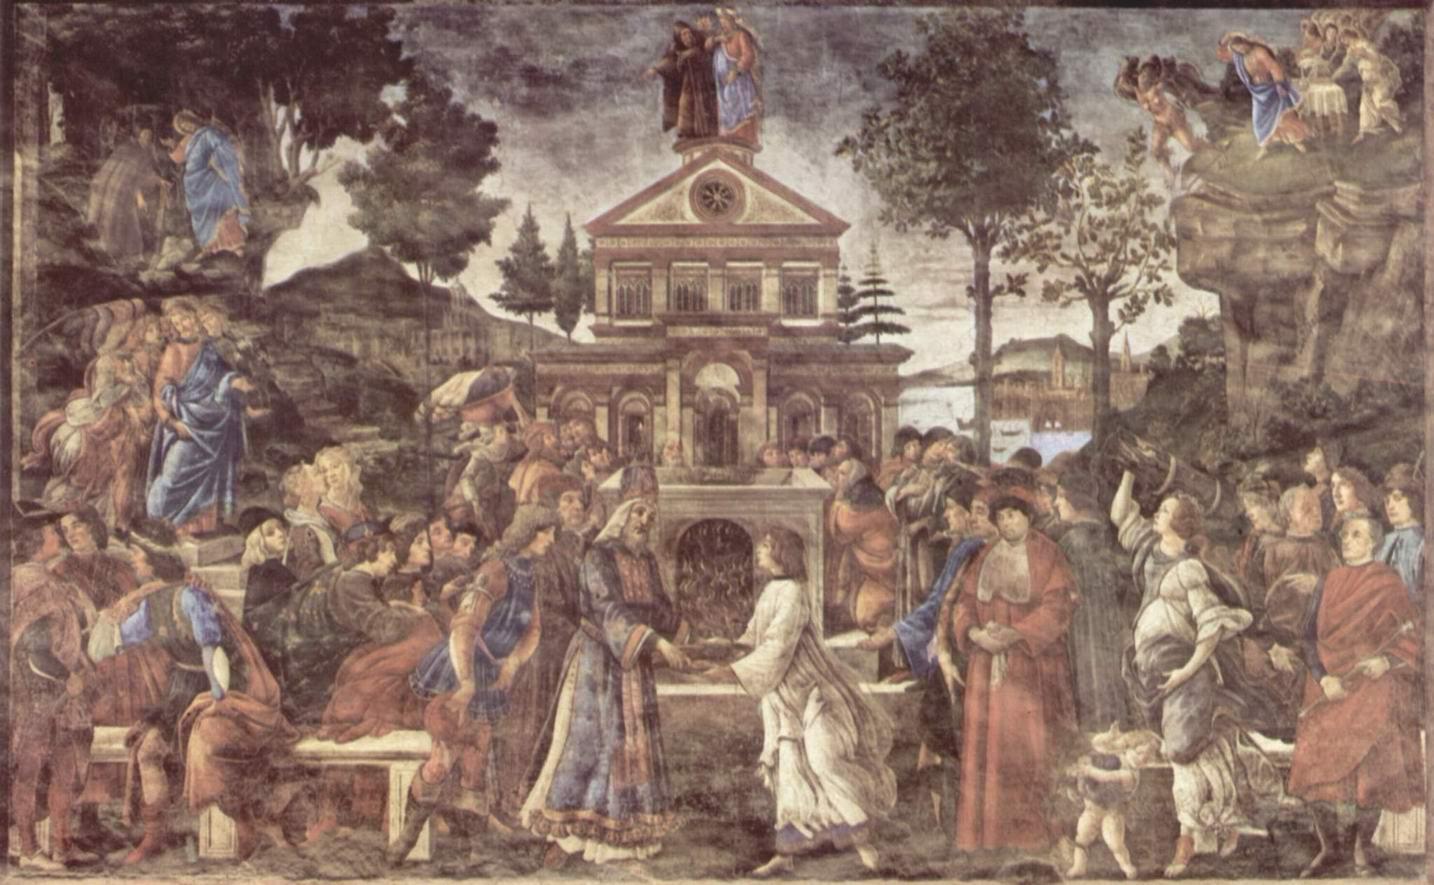 Фрески Сикстинской капеллы в Риме, Искушение Христа, Сандро Боттичелли